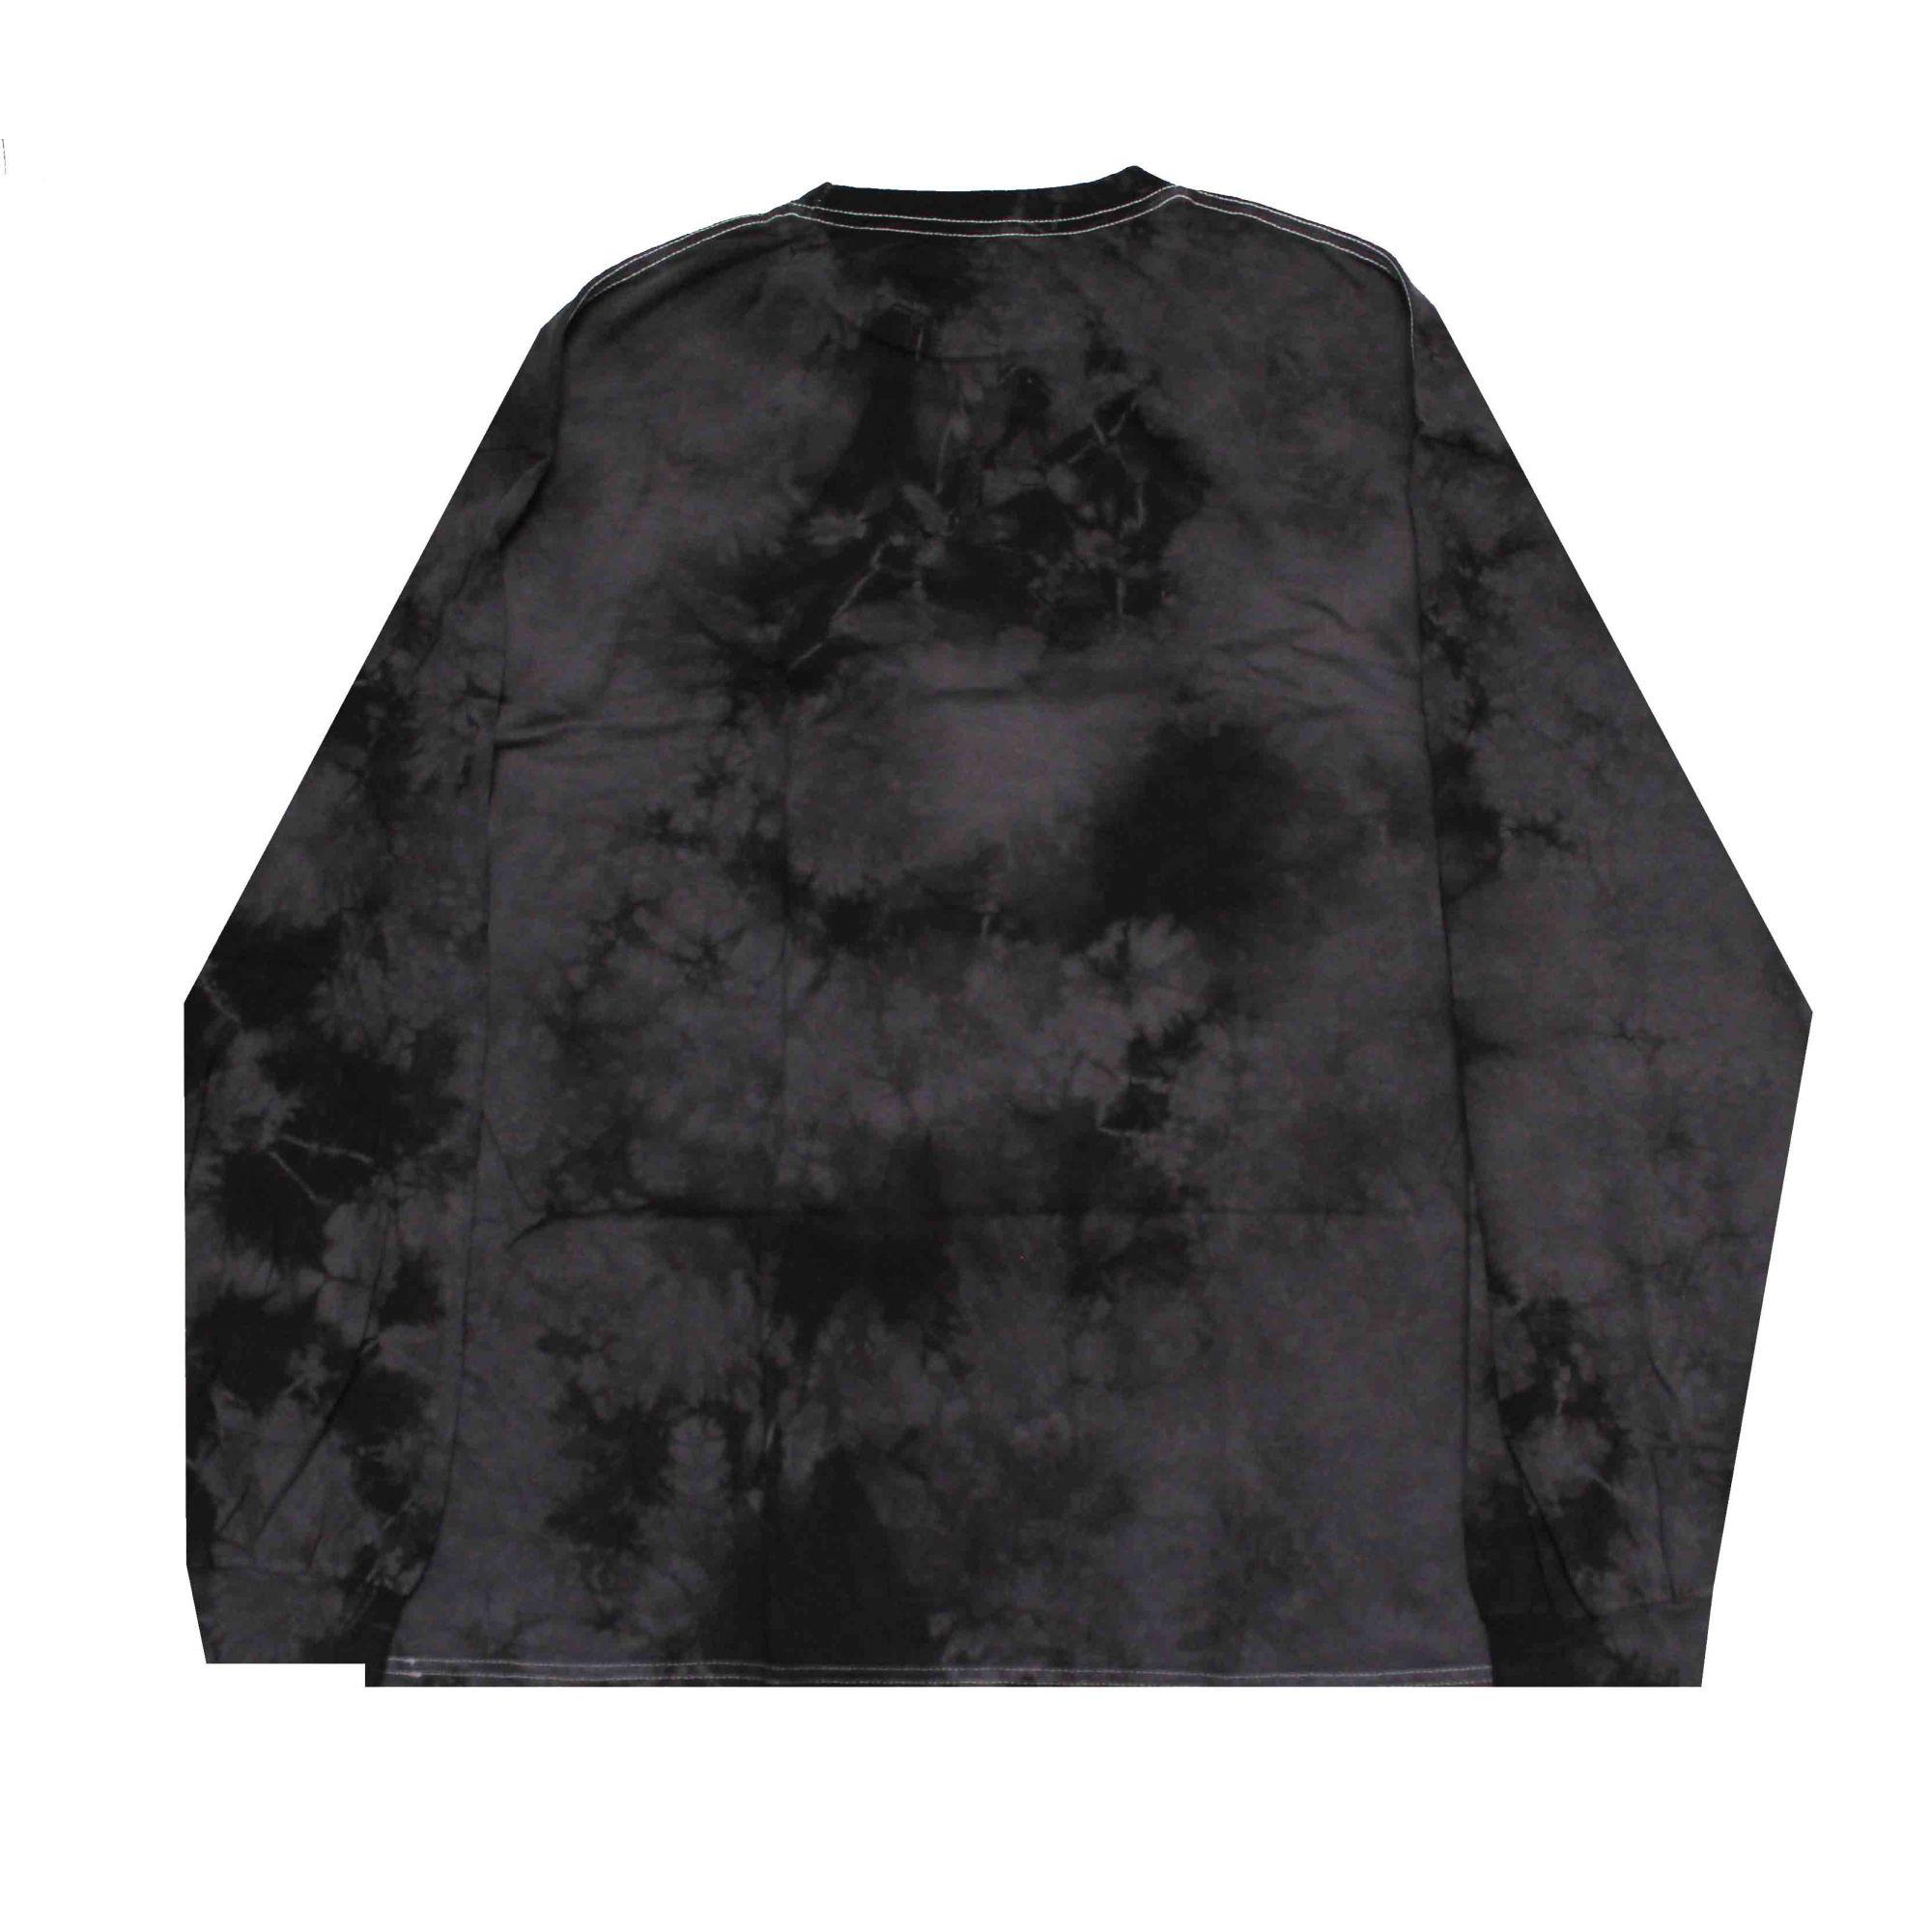 Camiseta Manga Longa Primitive Nuevo Cristal Wash Tie Dye Preto